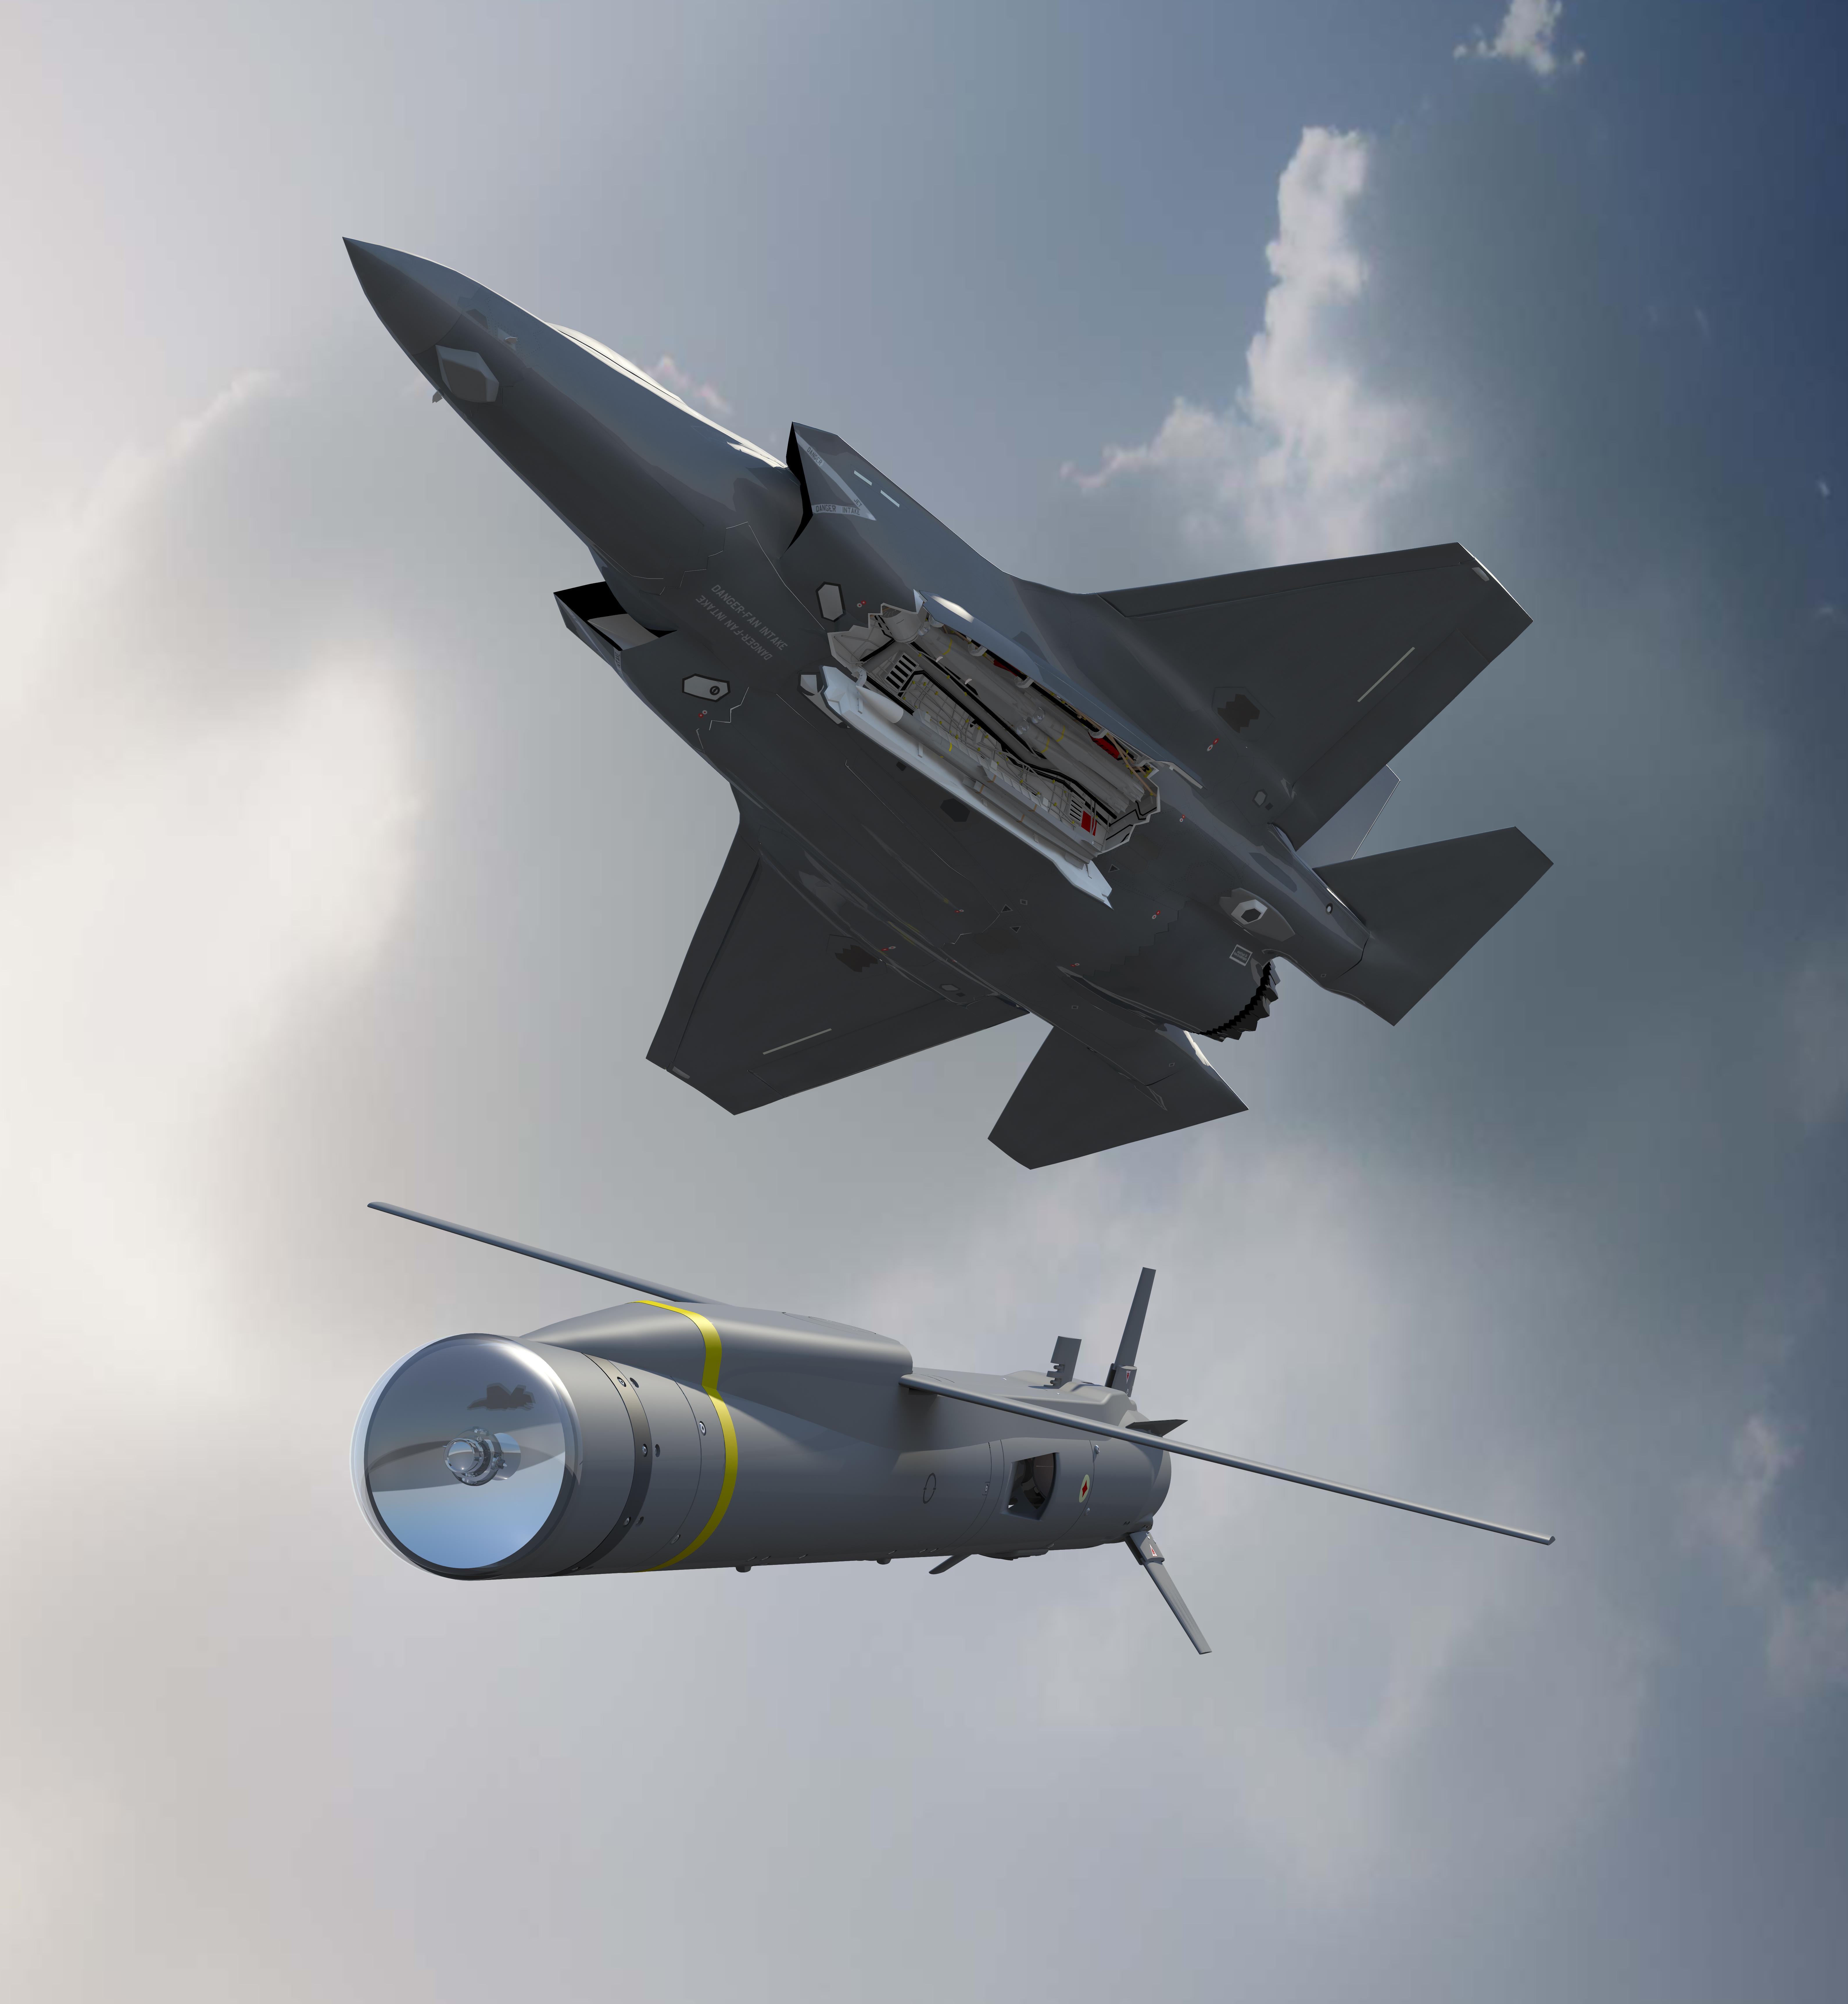 MBDA Showcases SPEAR Precision Strike Missile at